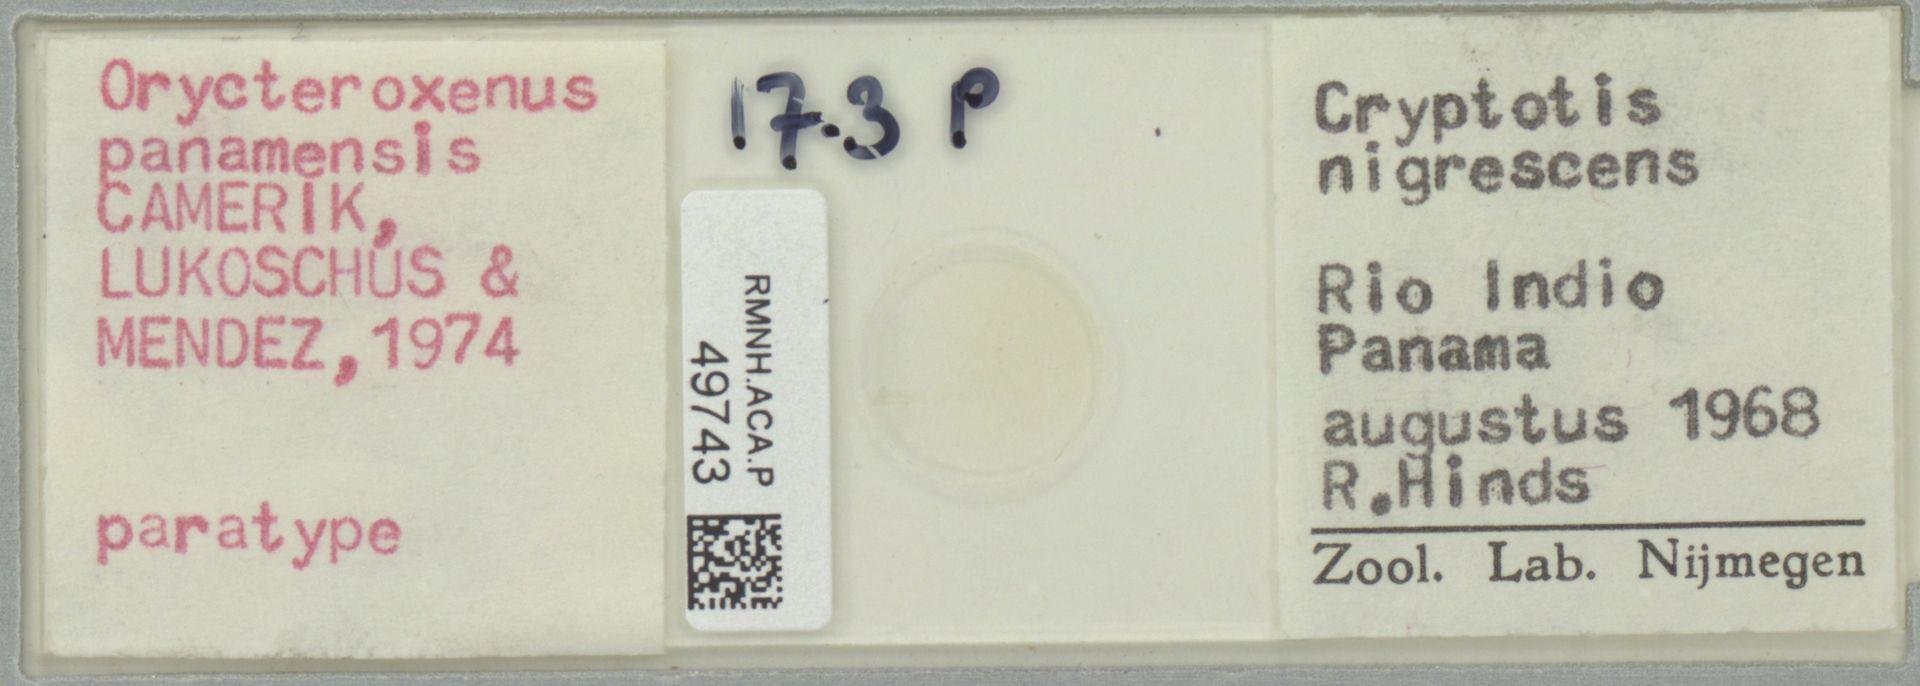 RMNH.ACA.P.49743   Orycteroxenus panamensis Camerik, Lukoschus & Mendez, 1974